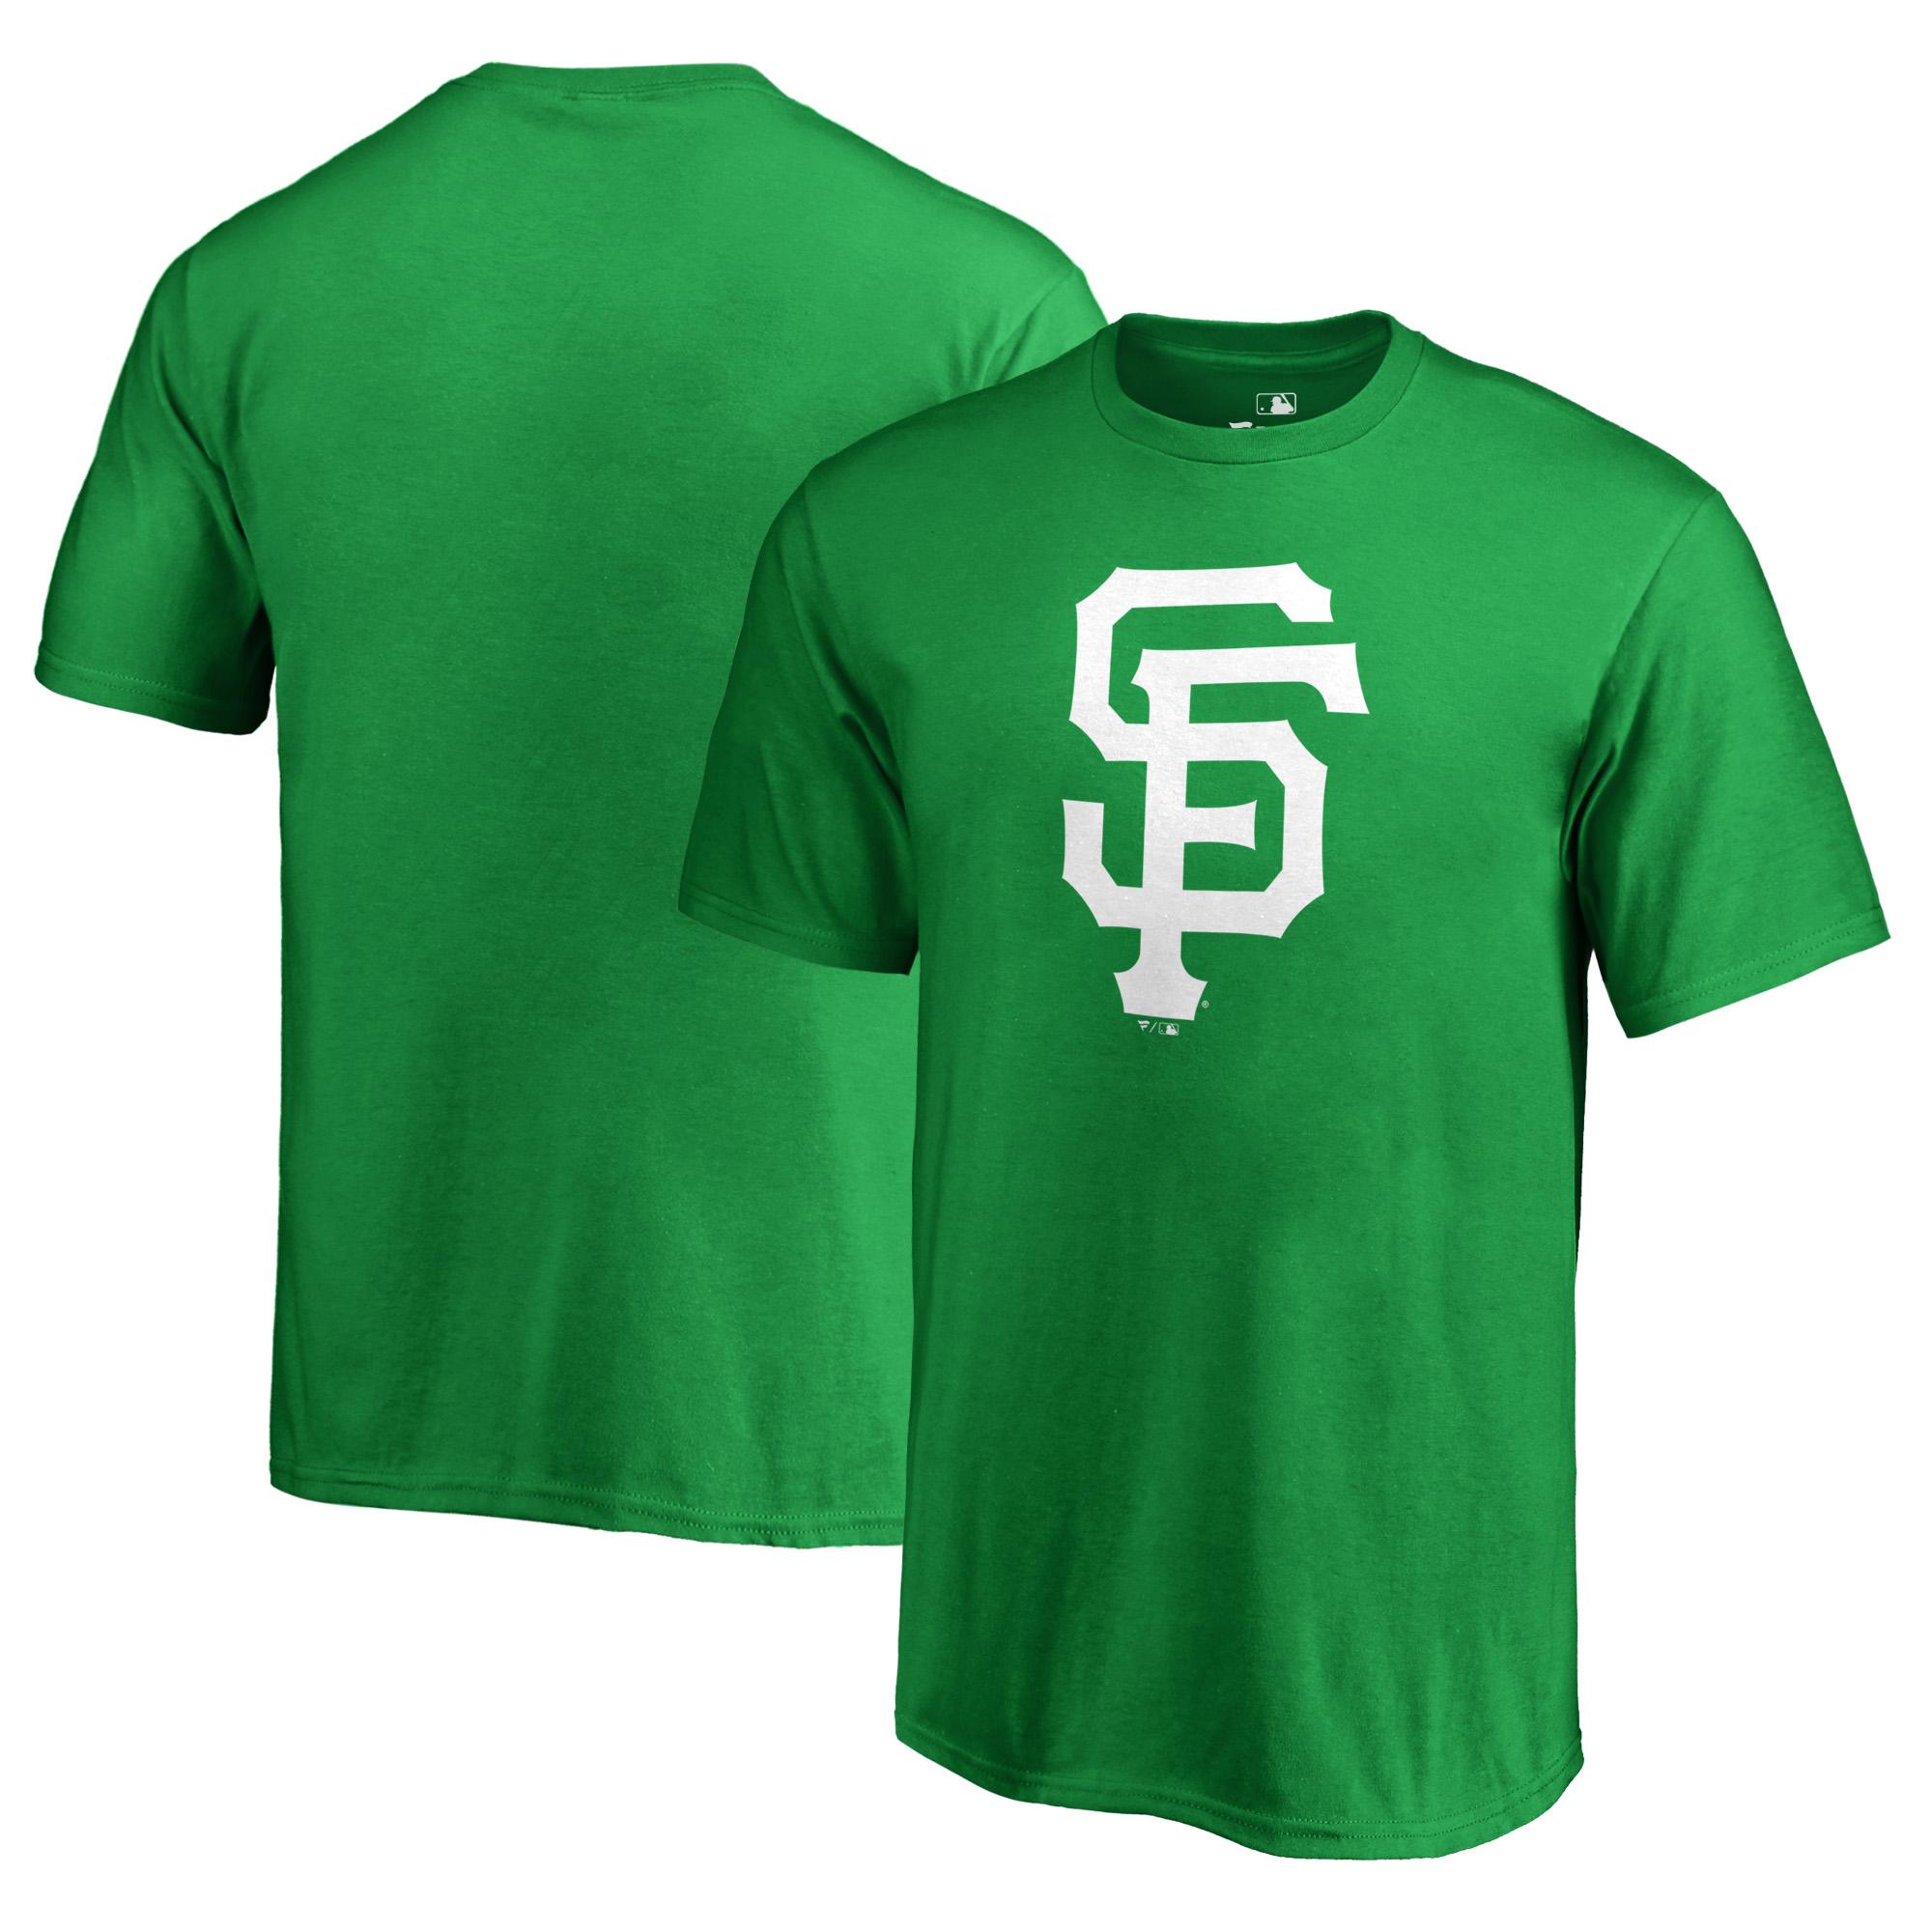 San Francisco Giants Fanatics Branded Youth St. Patrick's Day White Logo T-Shirt - Kelly Green